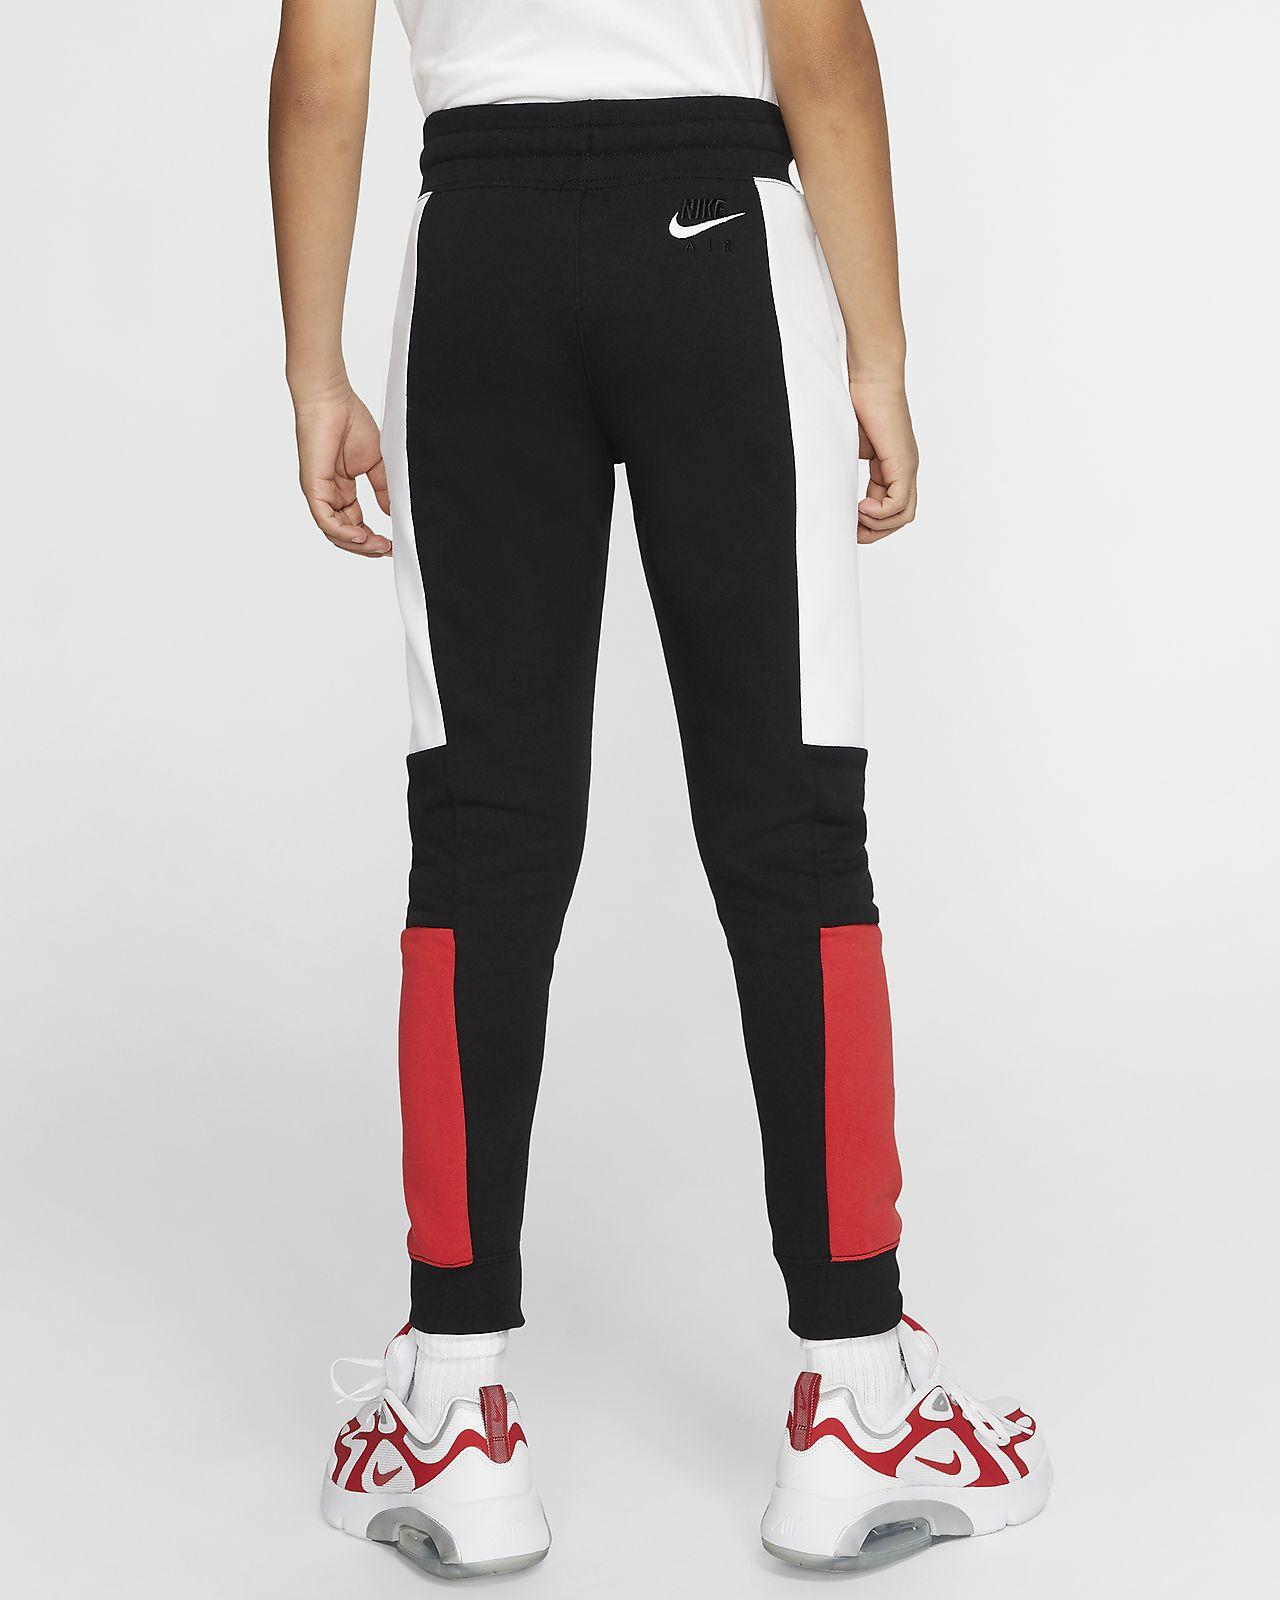 pantaloni nike jordan ragazzo